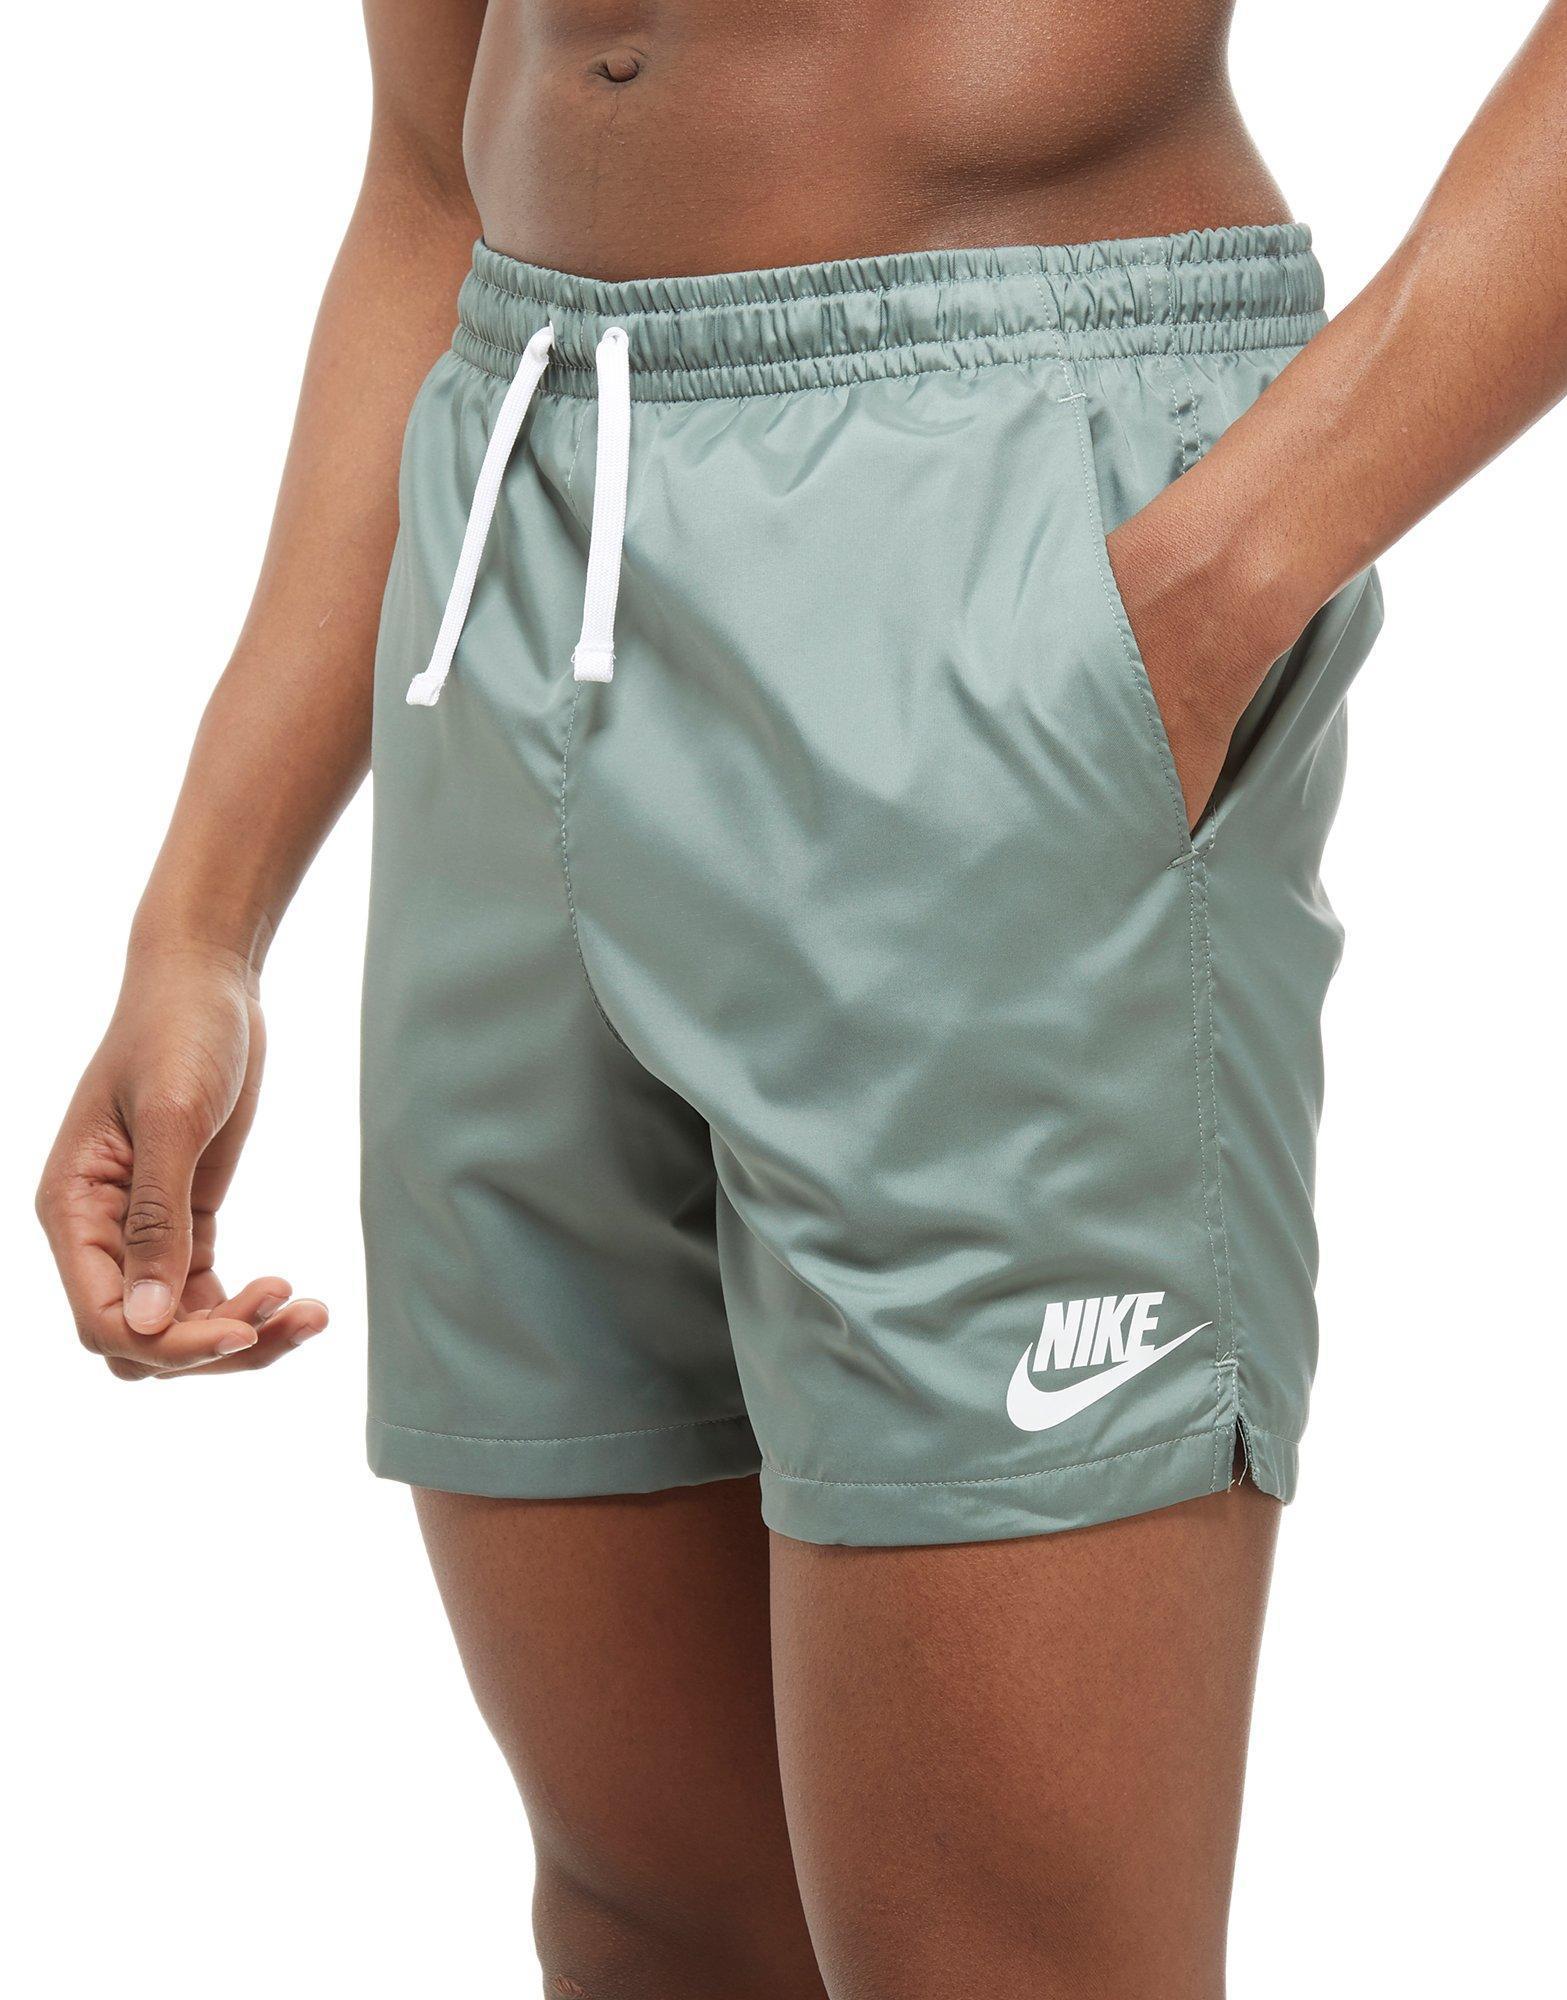 56abef975c Mens Nike Swim Shorts - About Foto Swim 2019